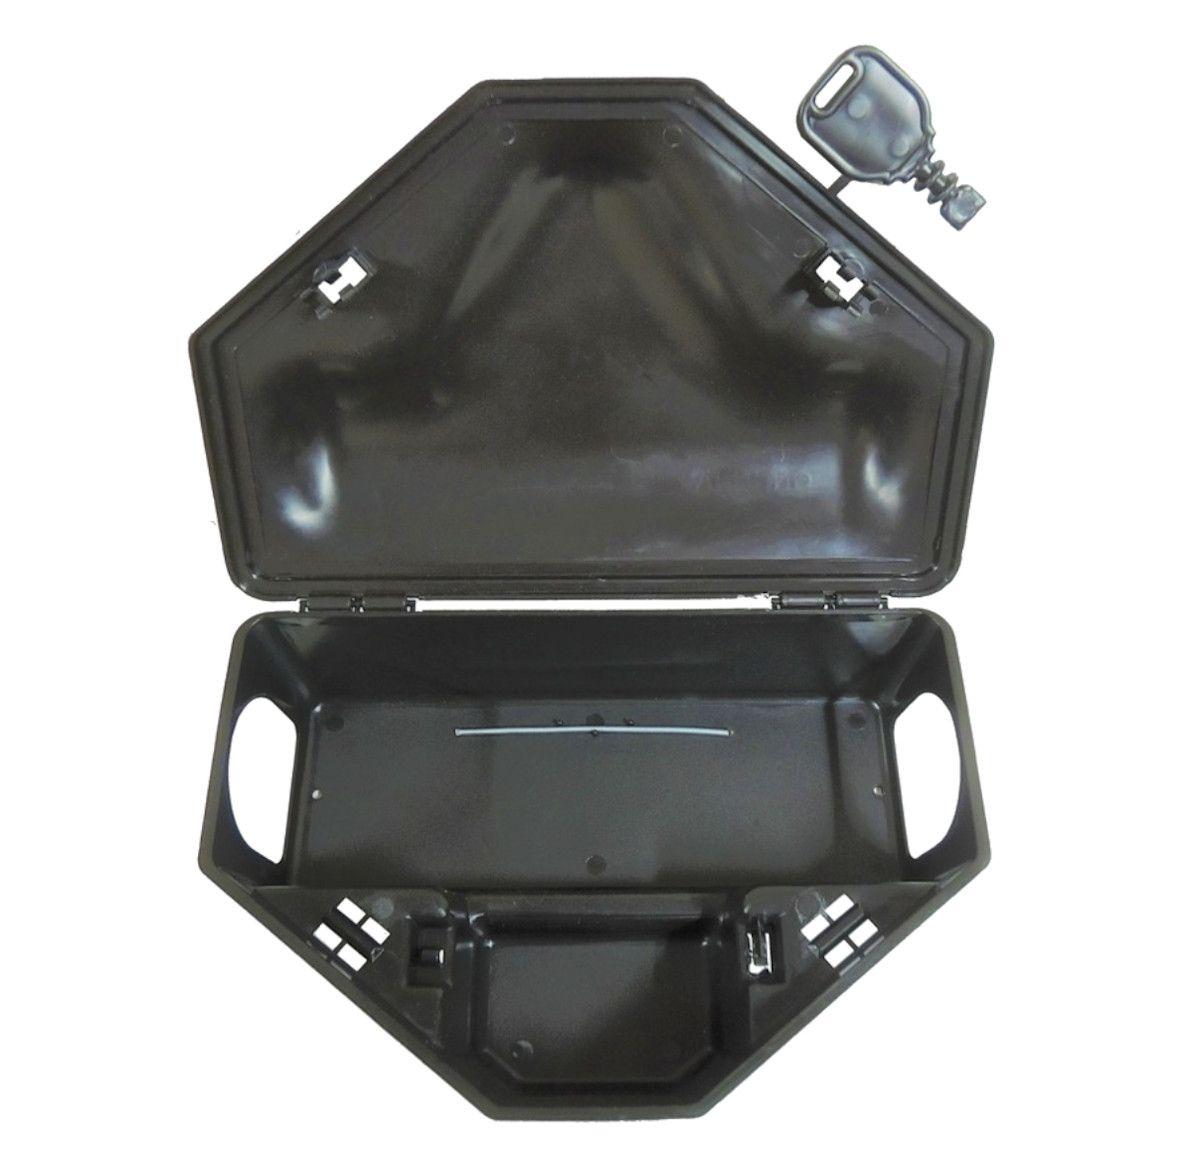 Kit 4 Porta Isca C/ 2 Chaves + 4 Bloco Extrusado Mata Seca